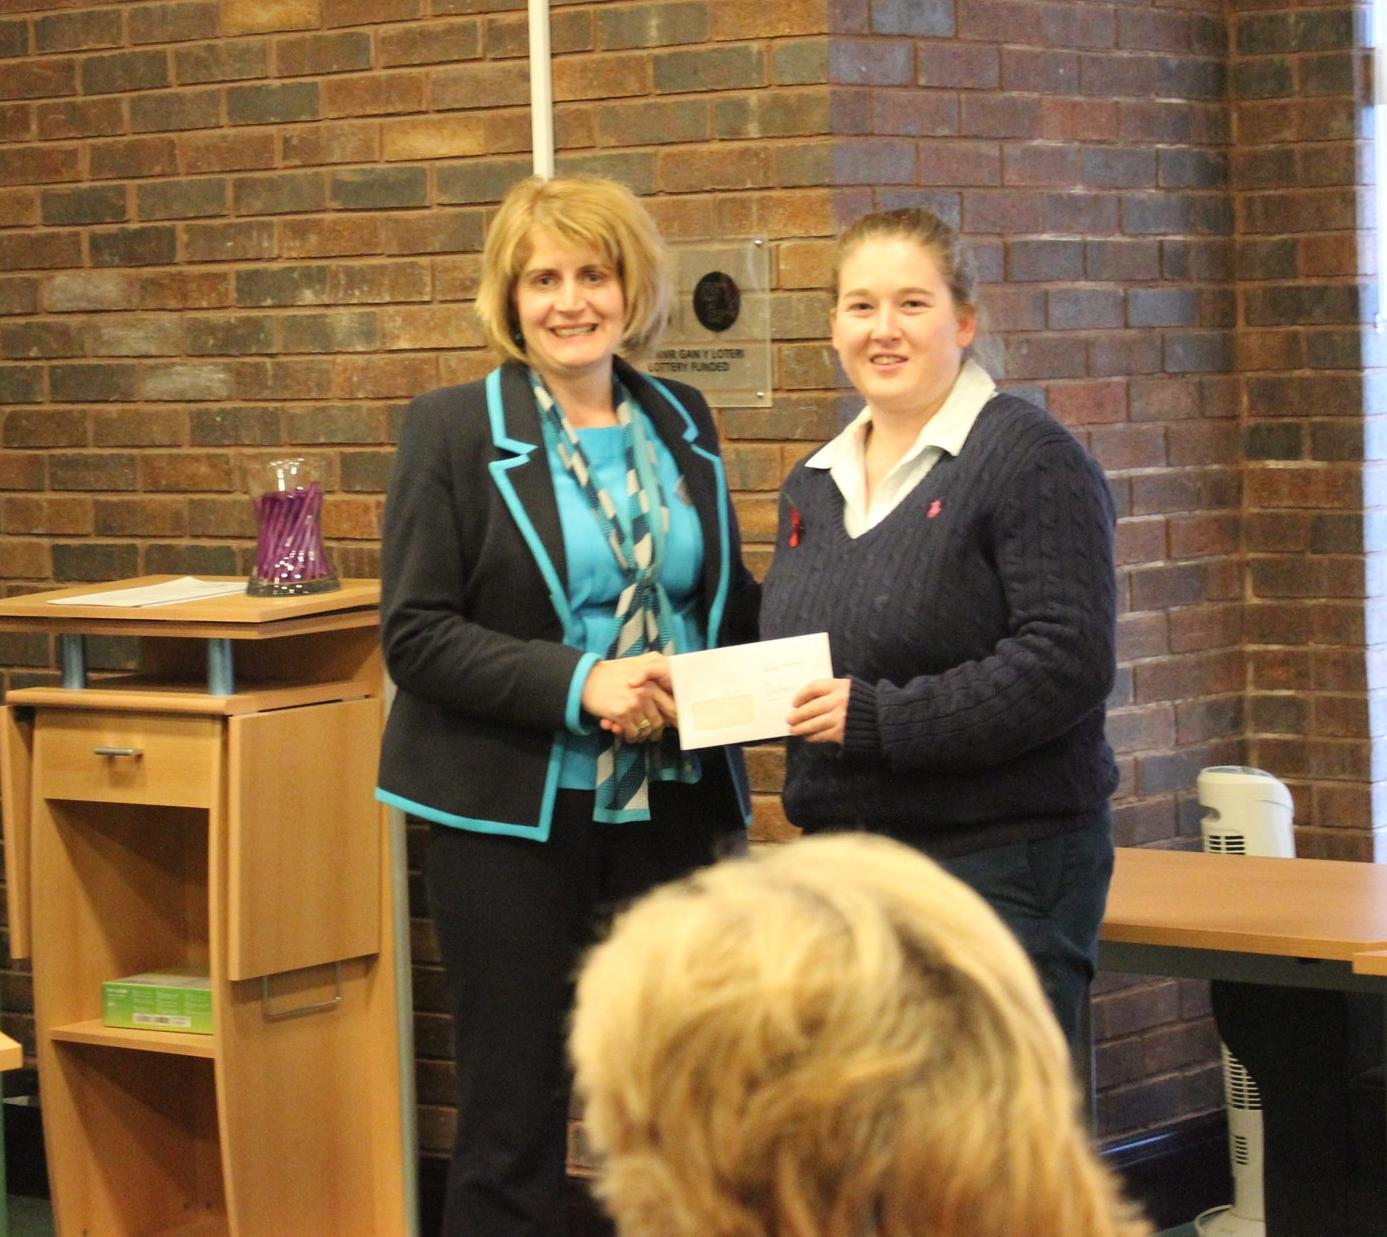 Teme Valley YFC Chairman Kim Barnett receiving the £150 Bursary from judge Jen Thomas